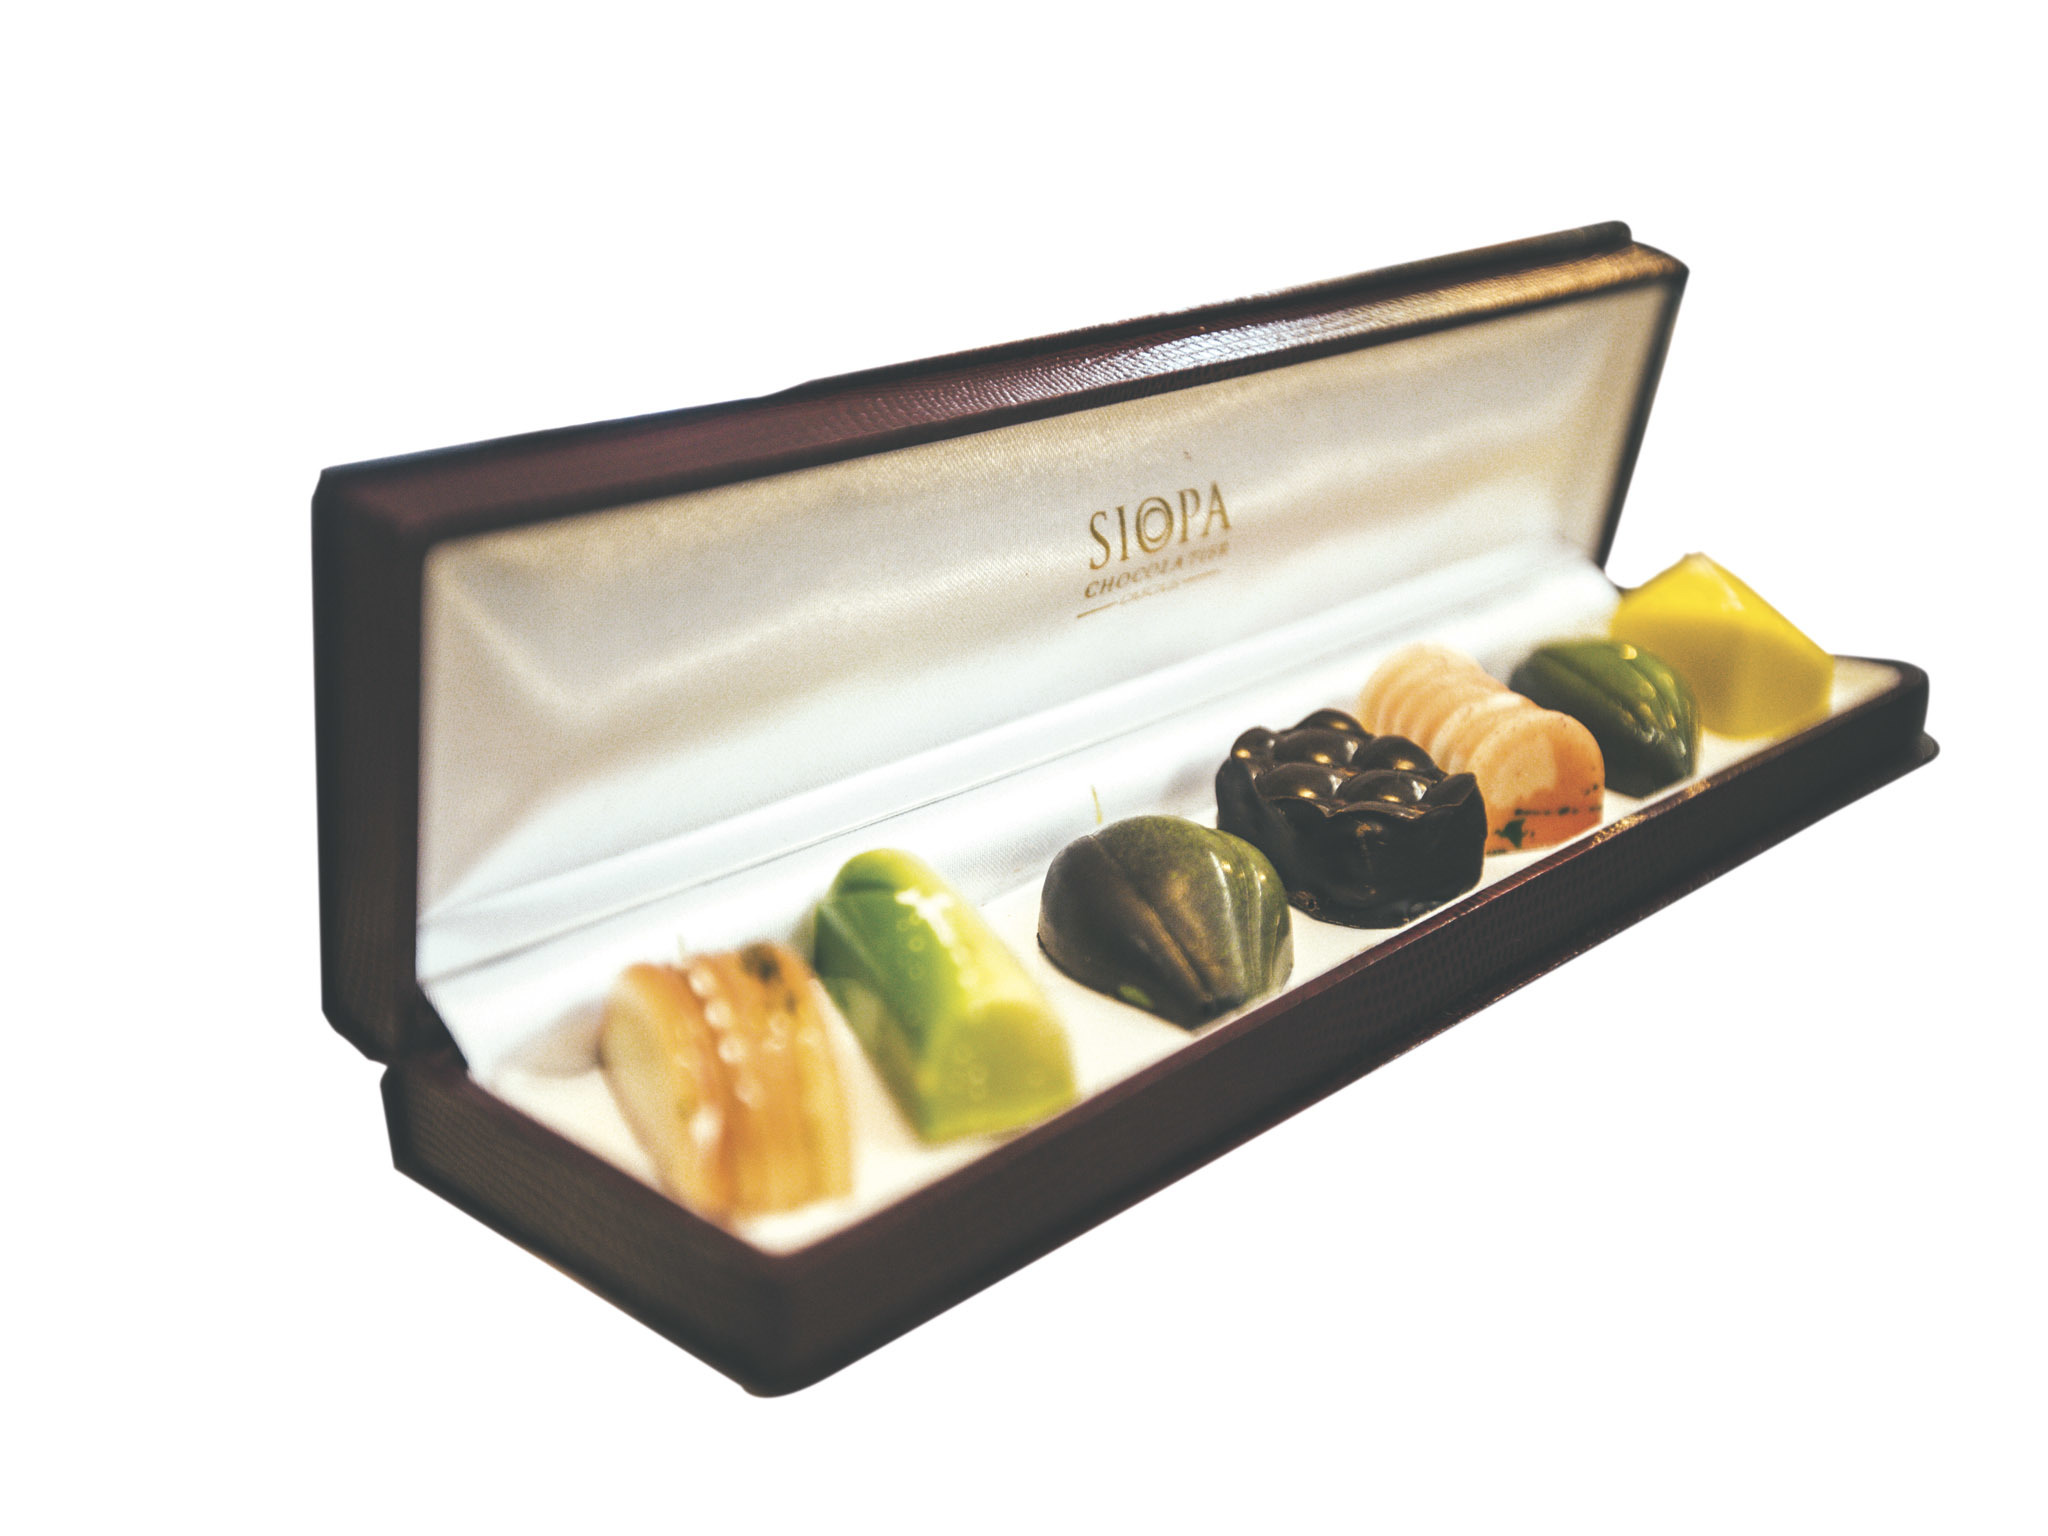 Siopa Chocolatier